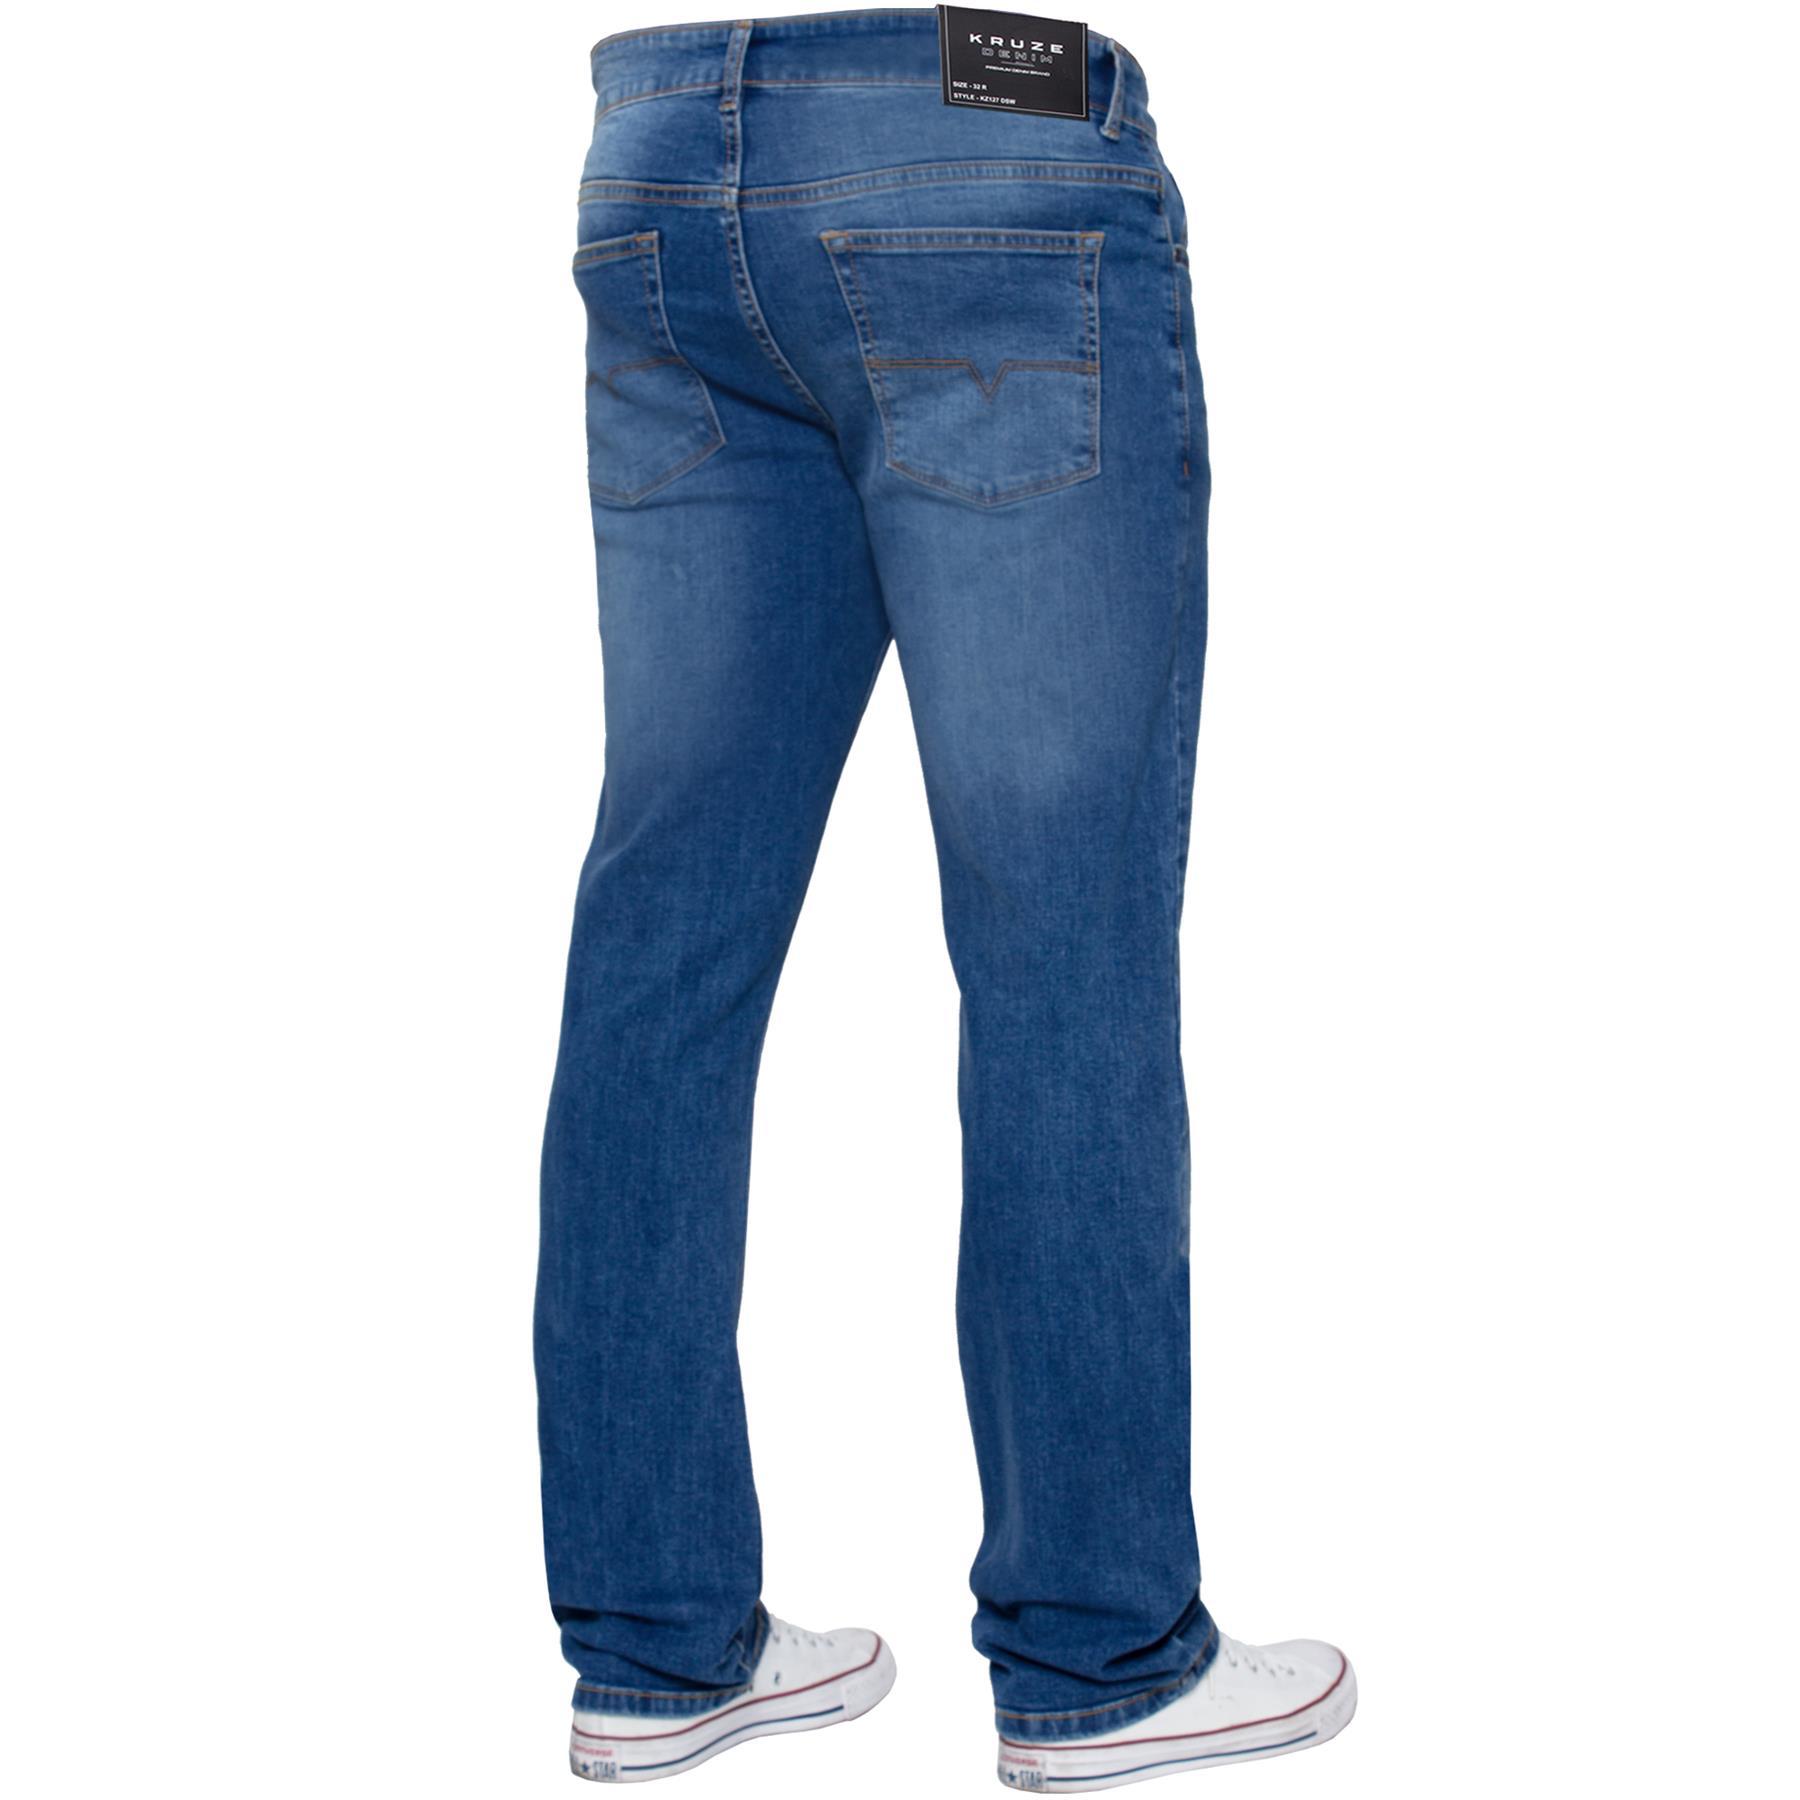 Para-Hombre-Pierna-Recta-Bootcut-Stretch-Denim-Regulares-Pantalon-de-trabajo-Kruze-Todas-Cinturas miniatura 10